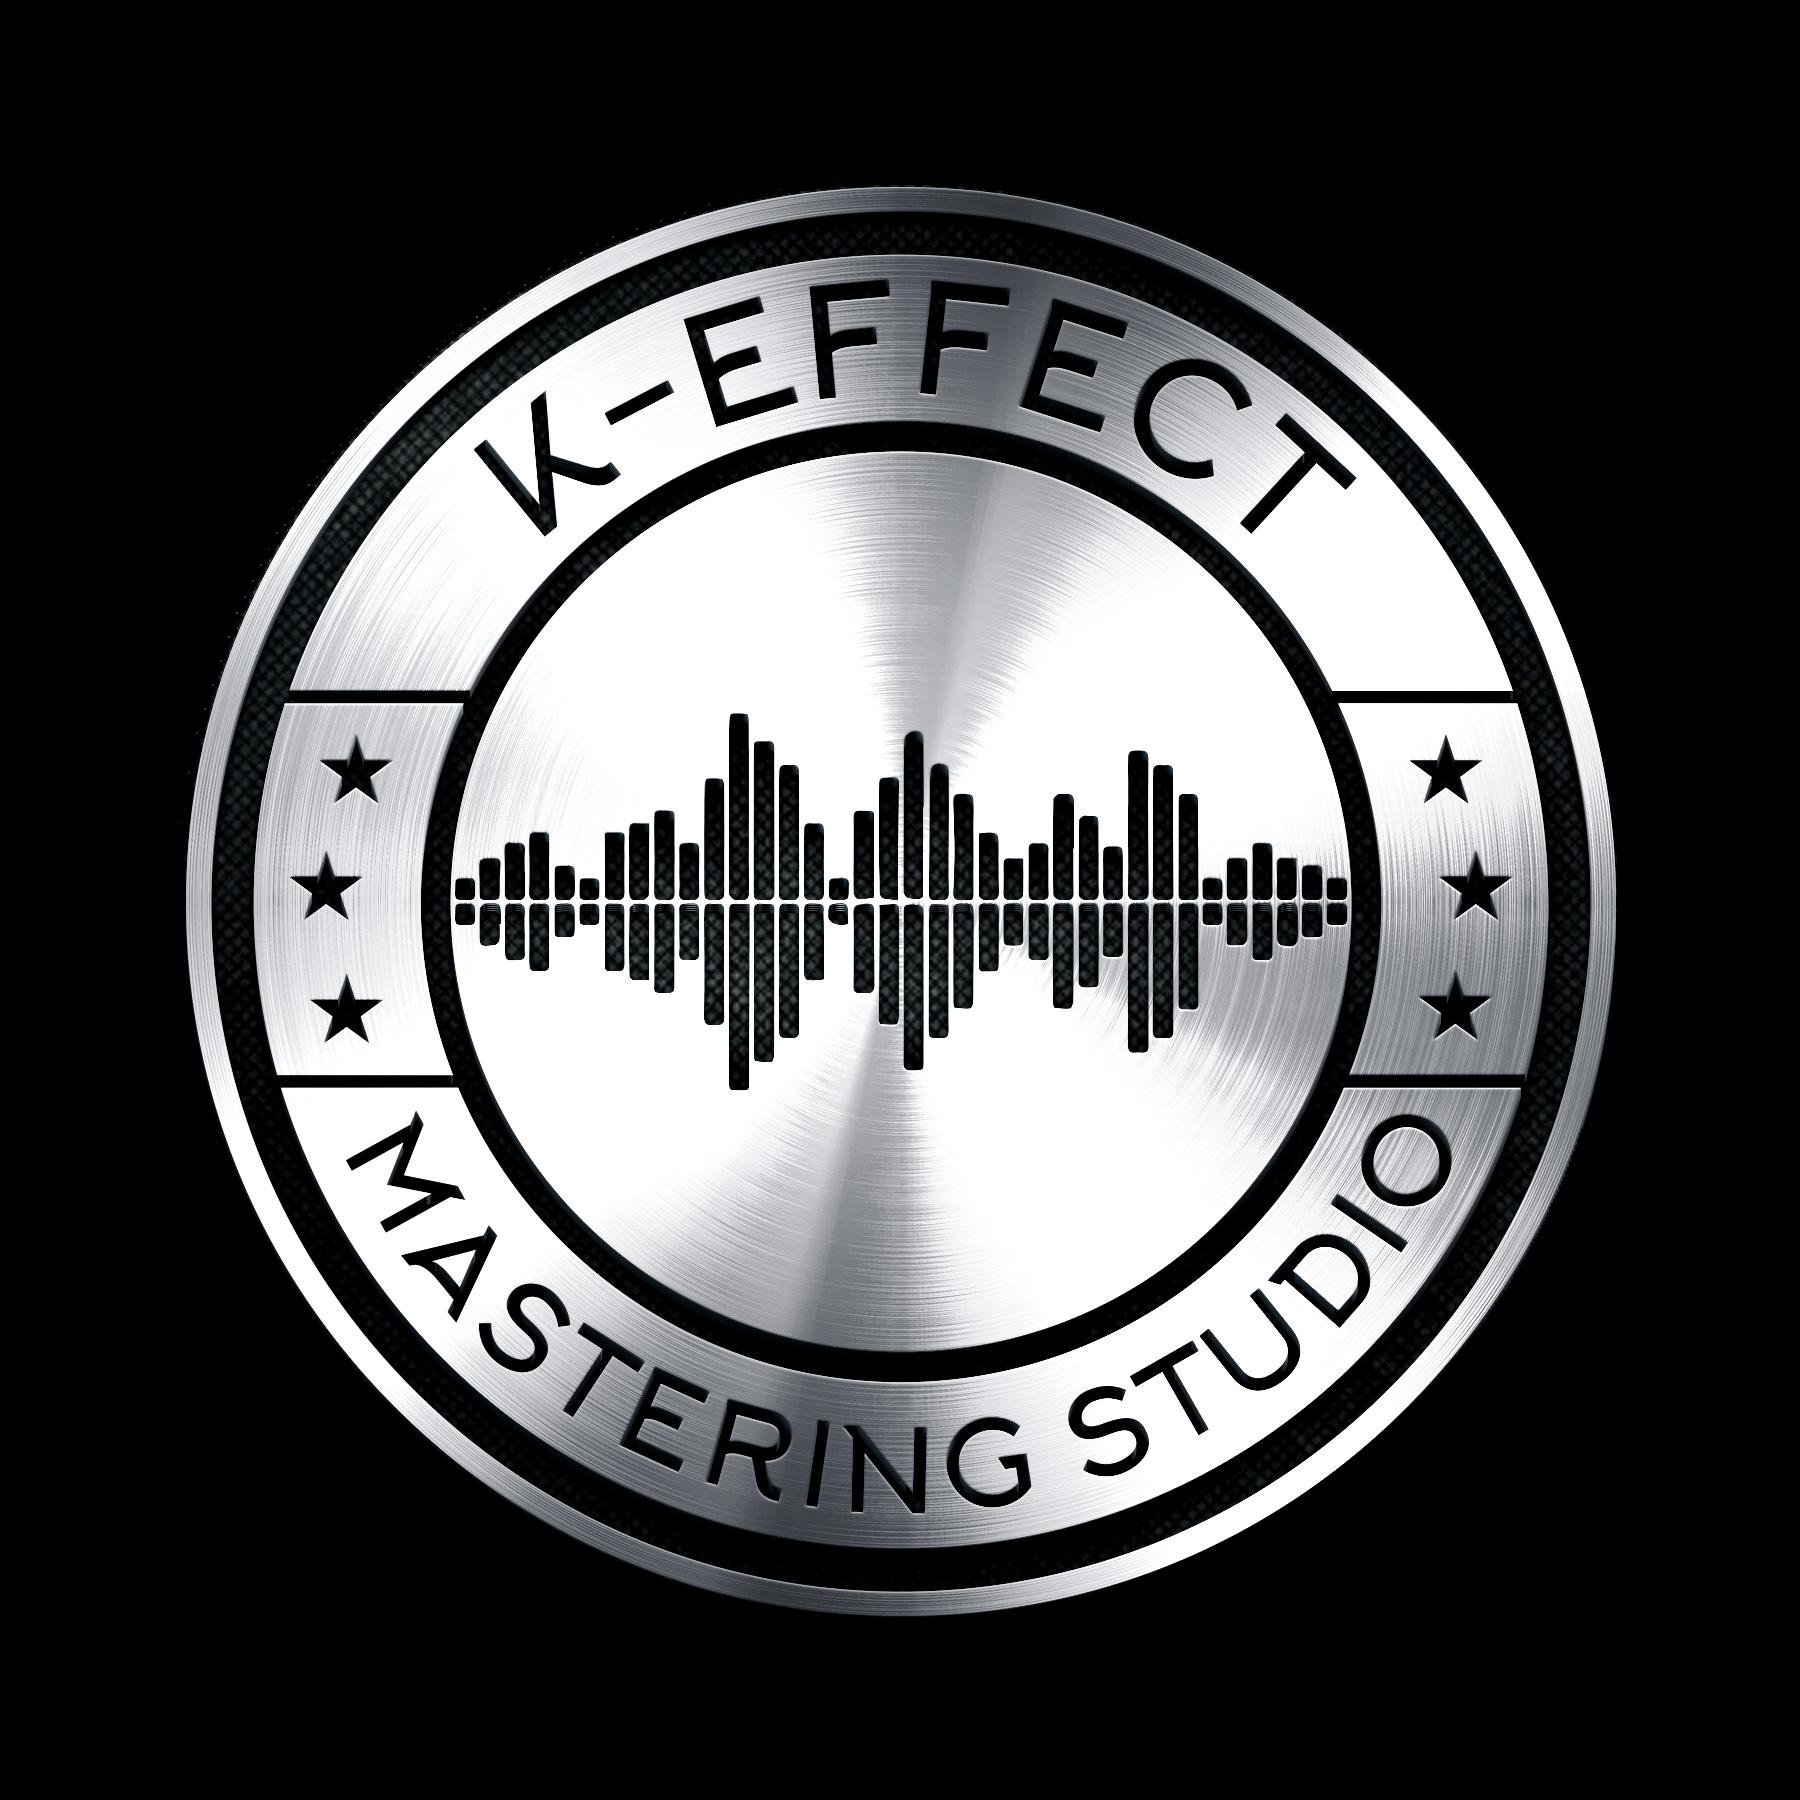 K-EFFECT MASTERING